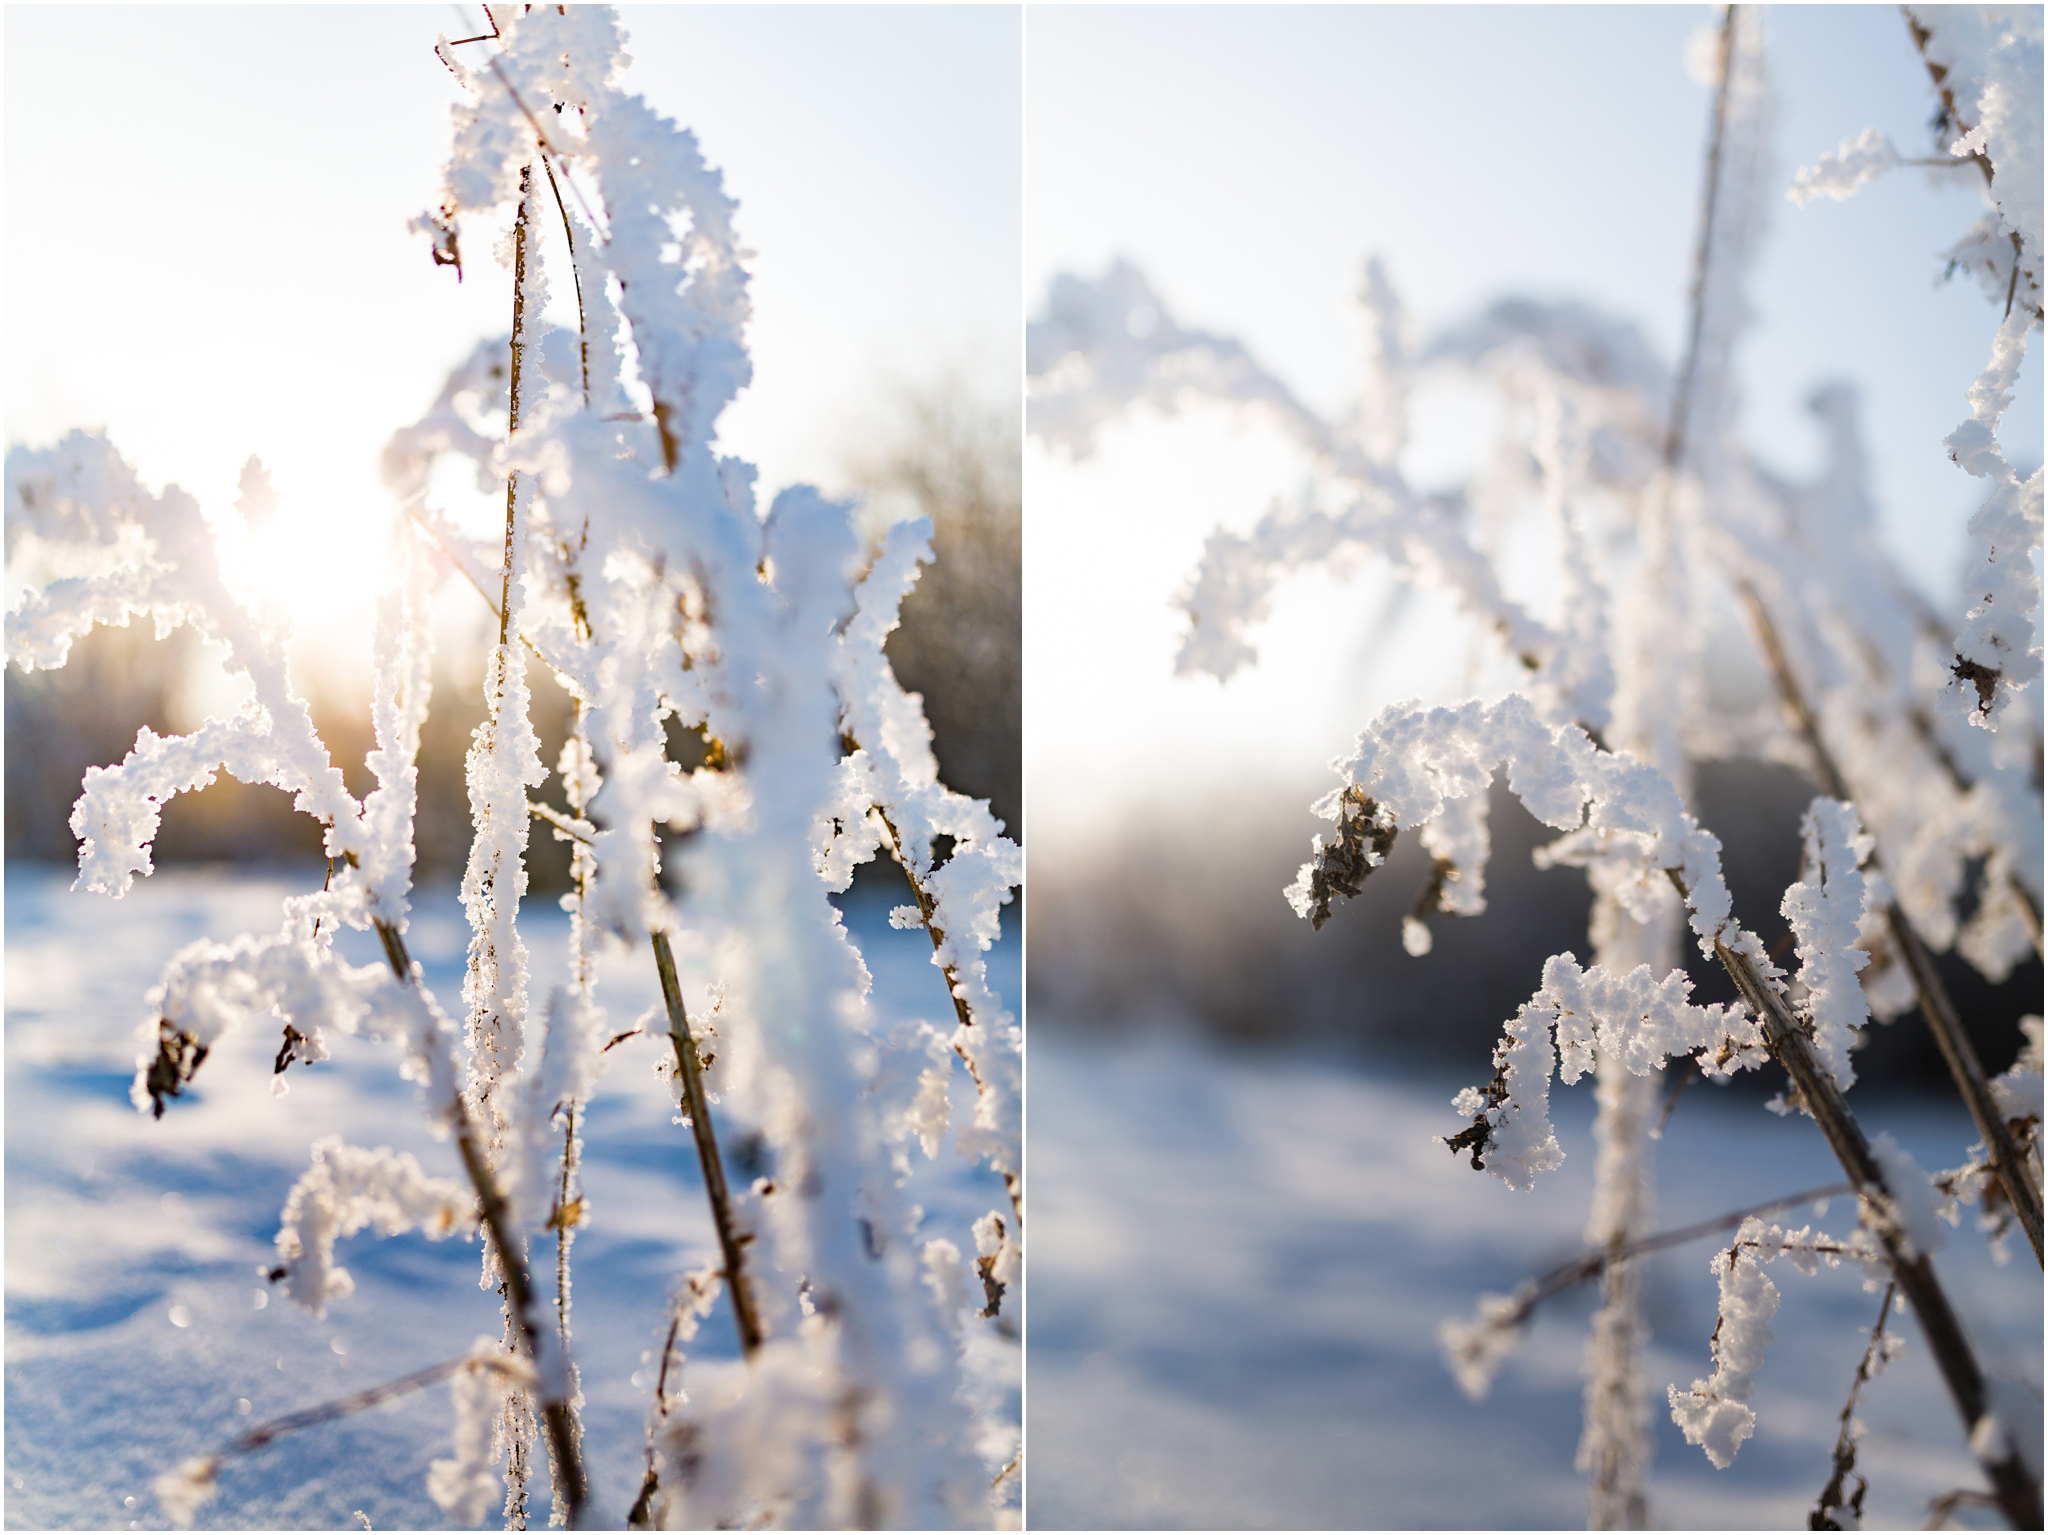 Treelines Photography - Edmonton Photographer - Edmonton Hoar Frost - YEG Winter